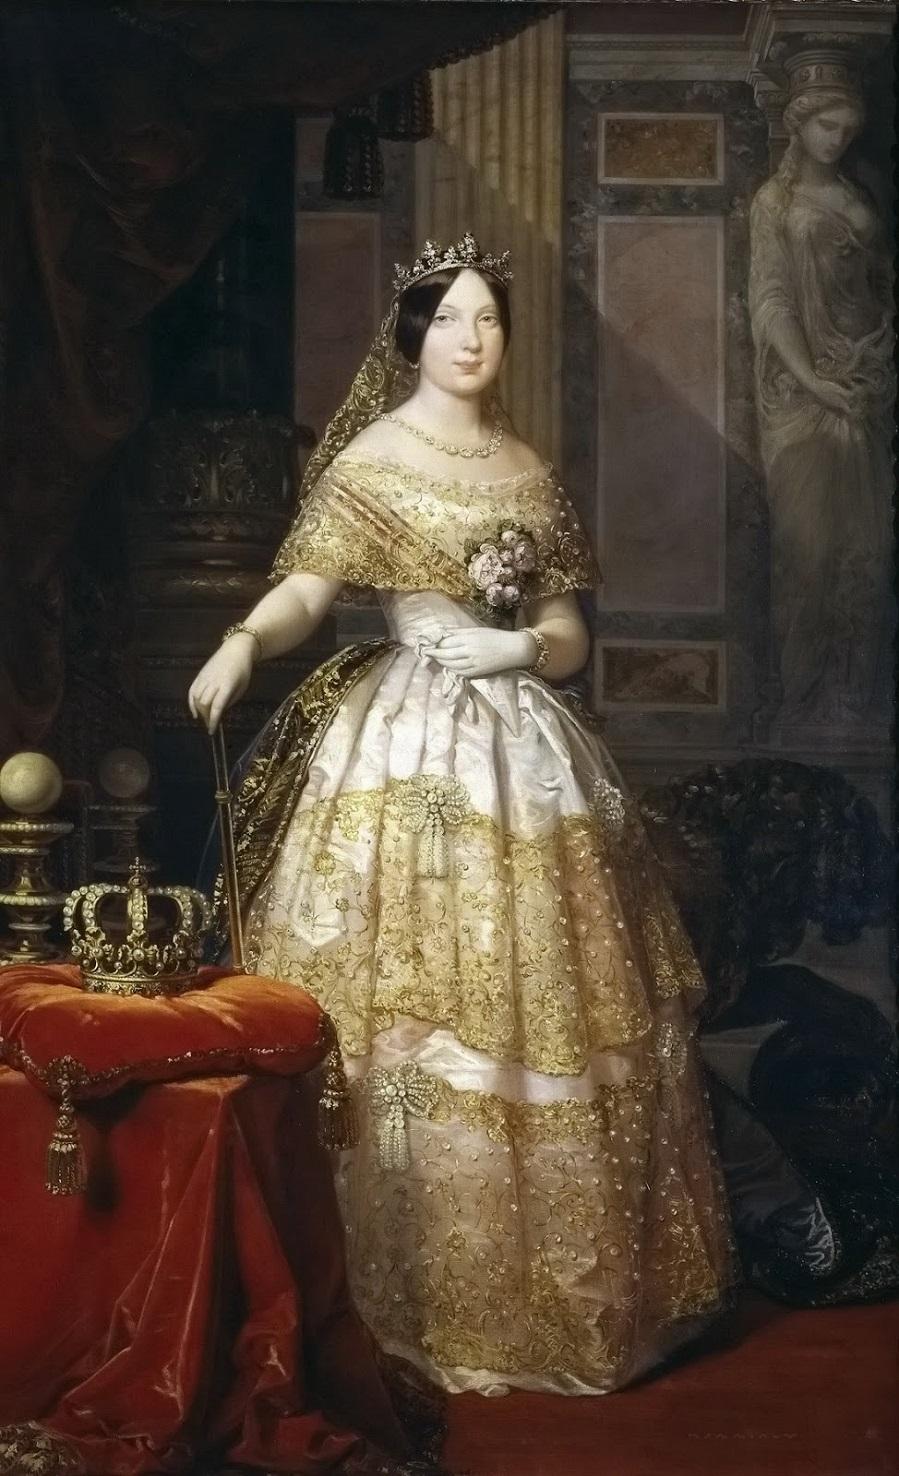 1_1848_Портрет Изабеллы II, королева Испании_217 x 136_х.,м._Мадрид, музей Прадо.jpeg